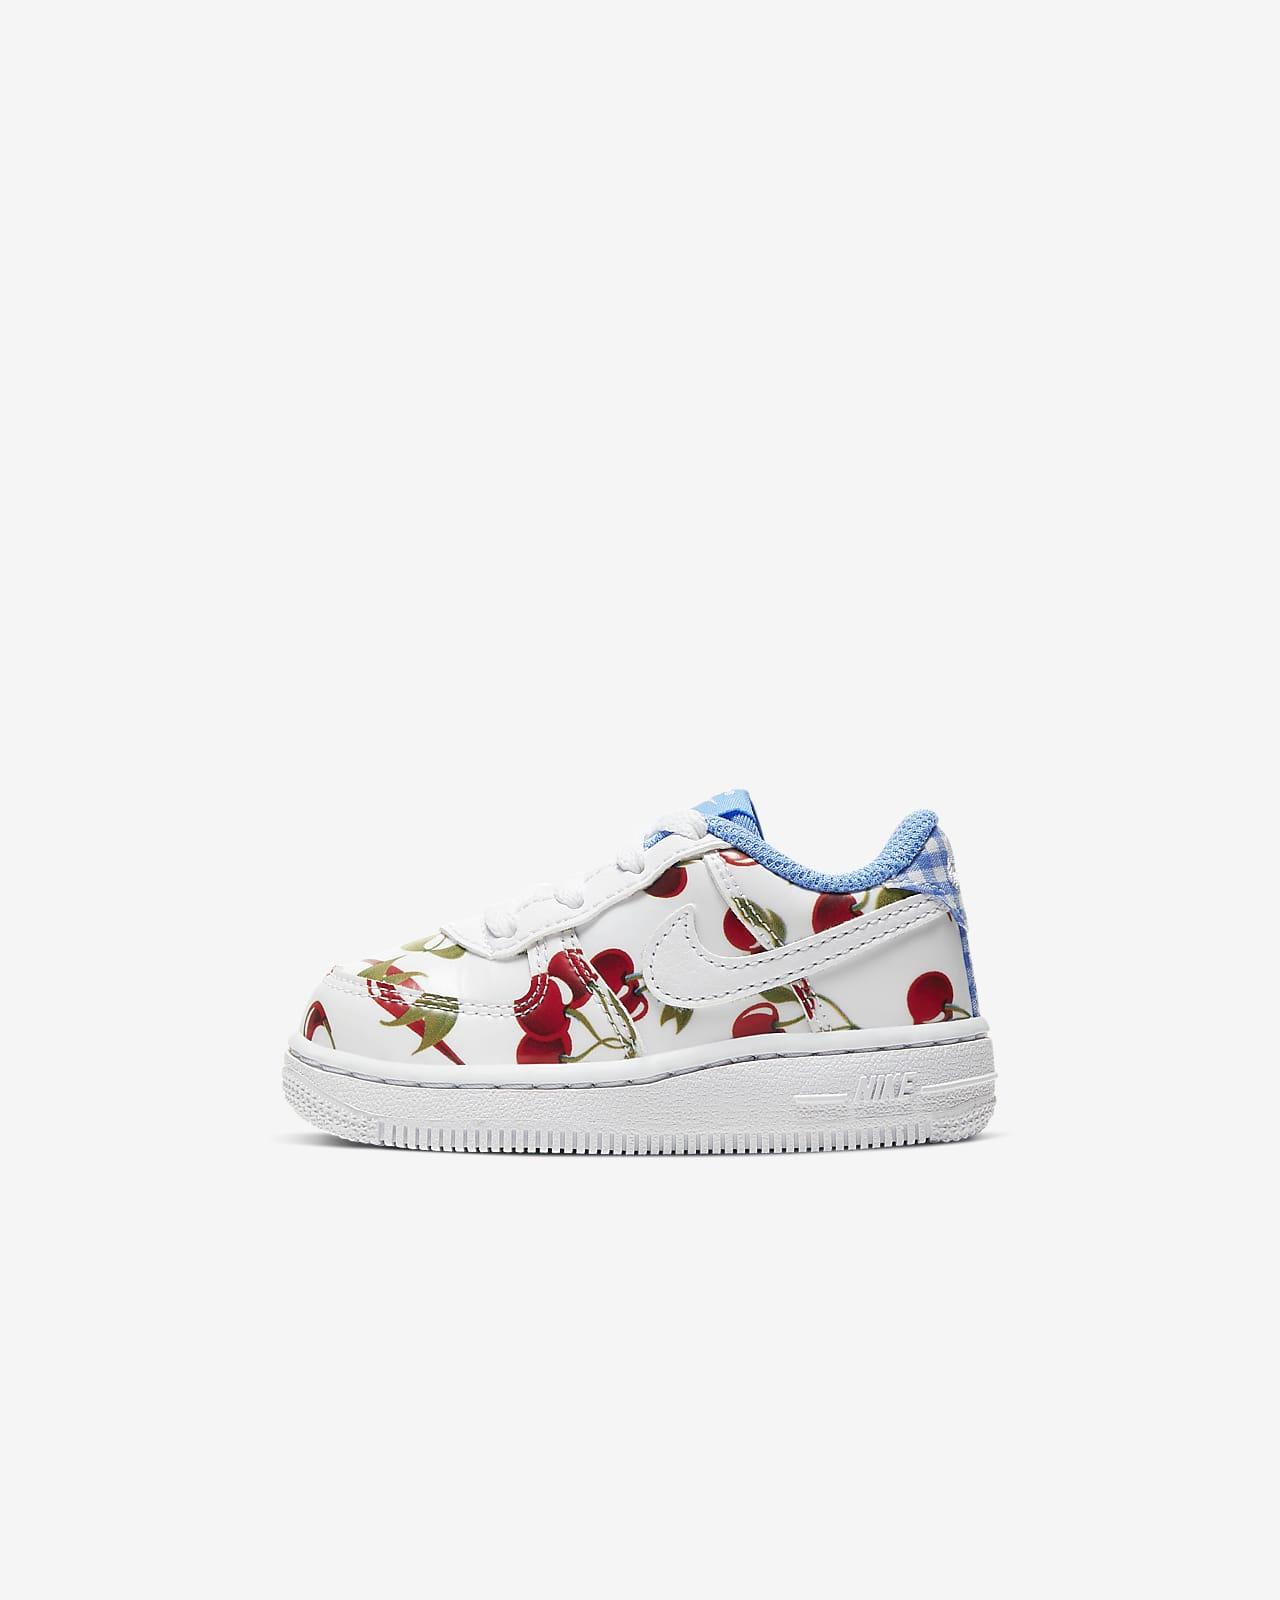 LV8 Baby and Toddler Shoe. Nike PH